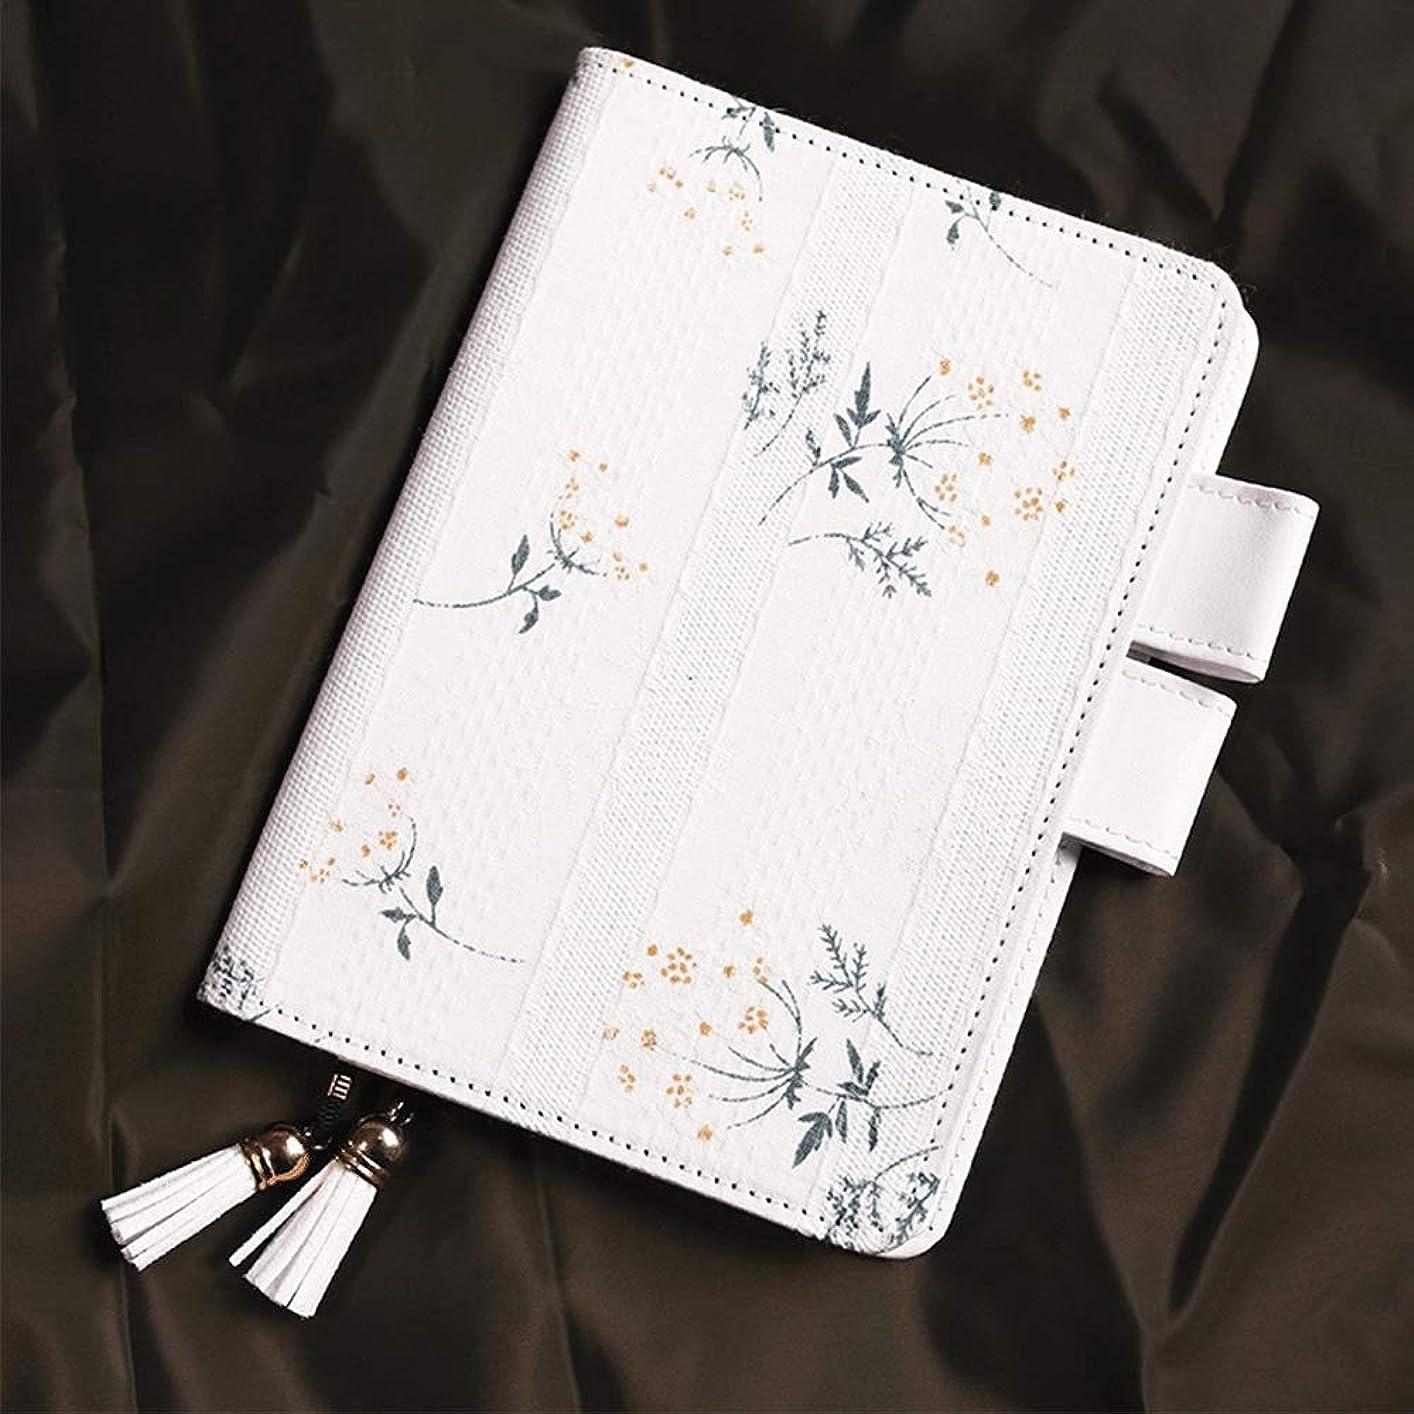 A6ノートブック花生地ジャーナルレザーハンドブックシンプルなメモ帳ファインアート日記 Blingstars